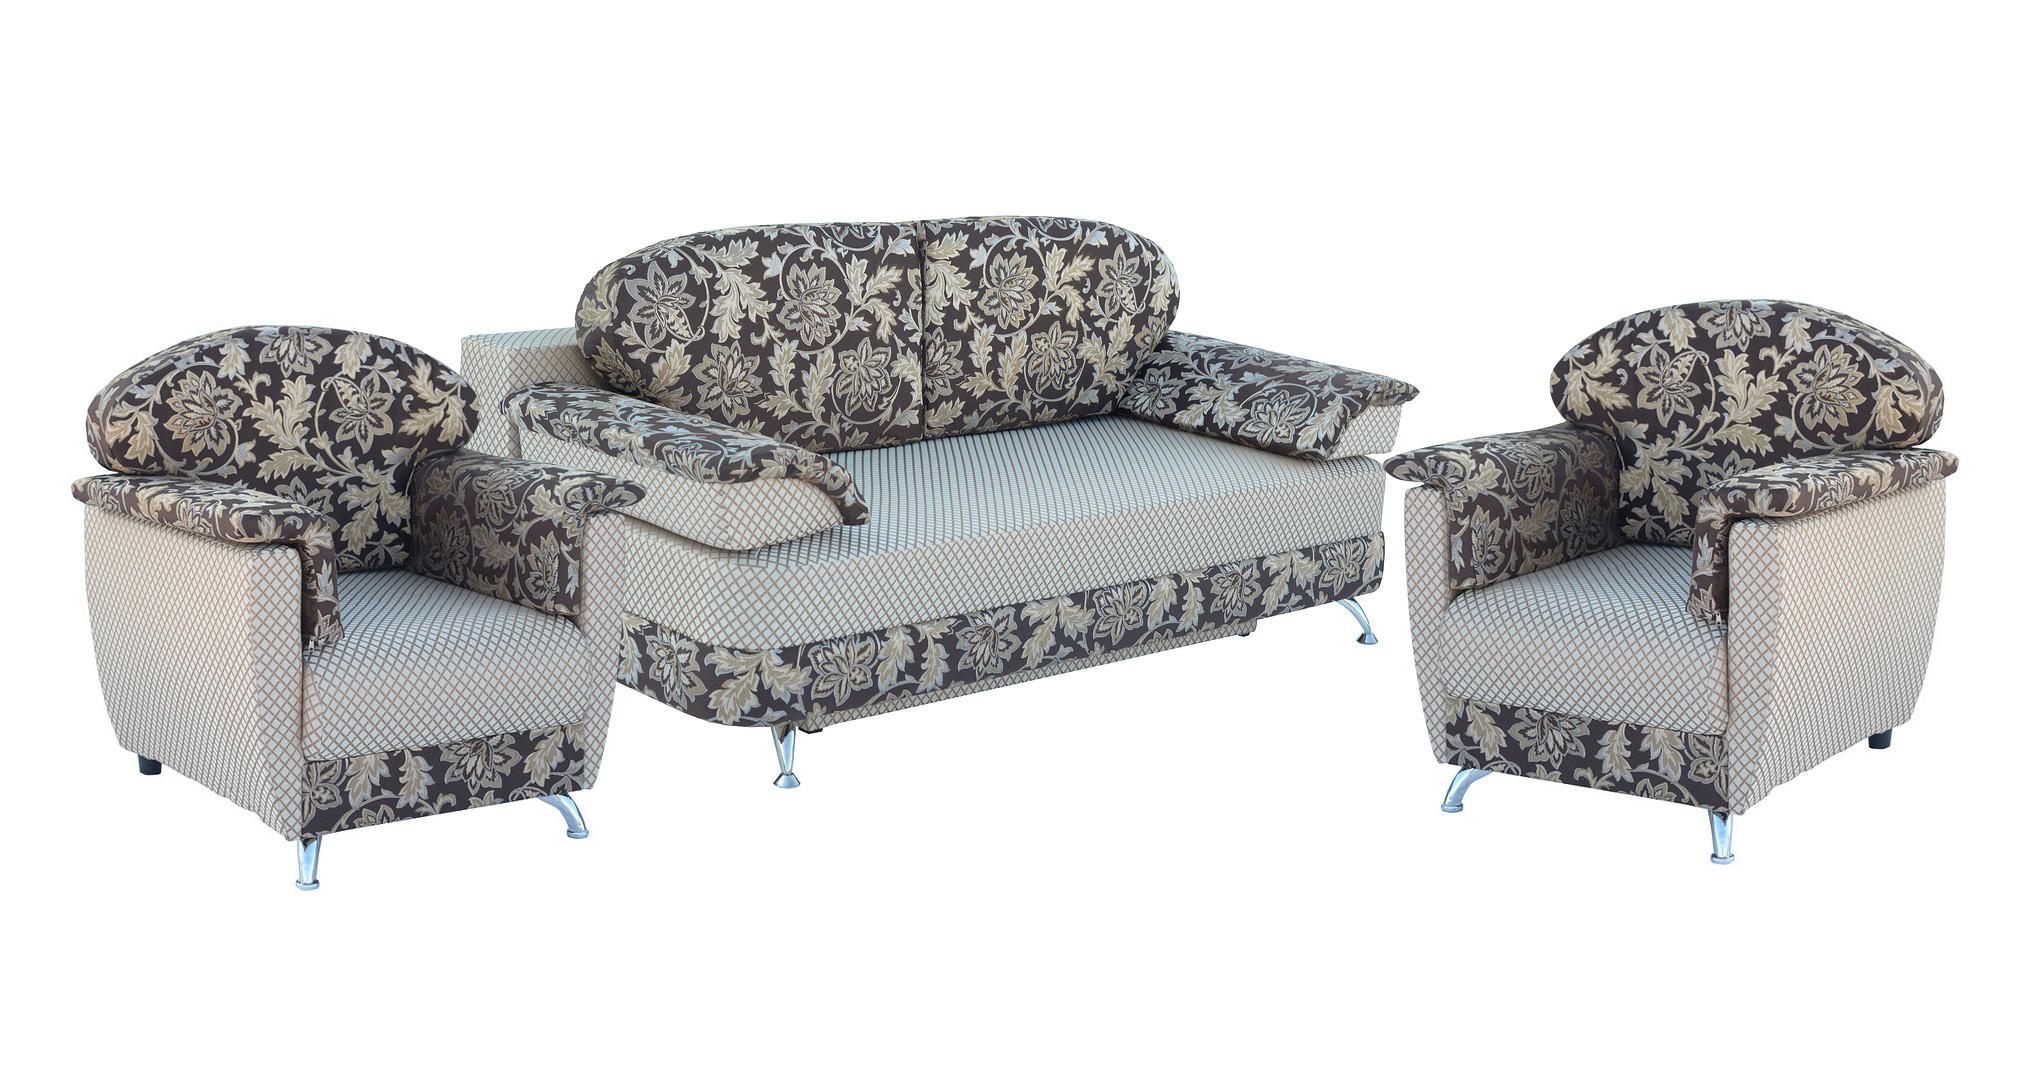 Комплект мягкой мебели Лагуна 3+1+1 Утин Размер: диван: 200х102 (сп. м. 146х200); кресло: 75х85